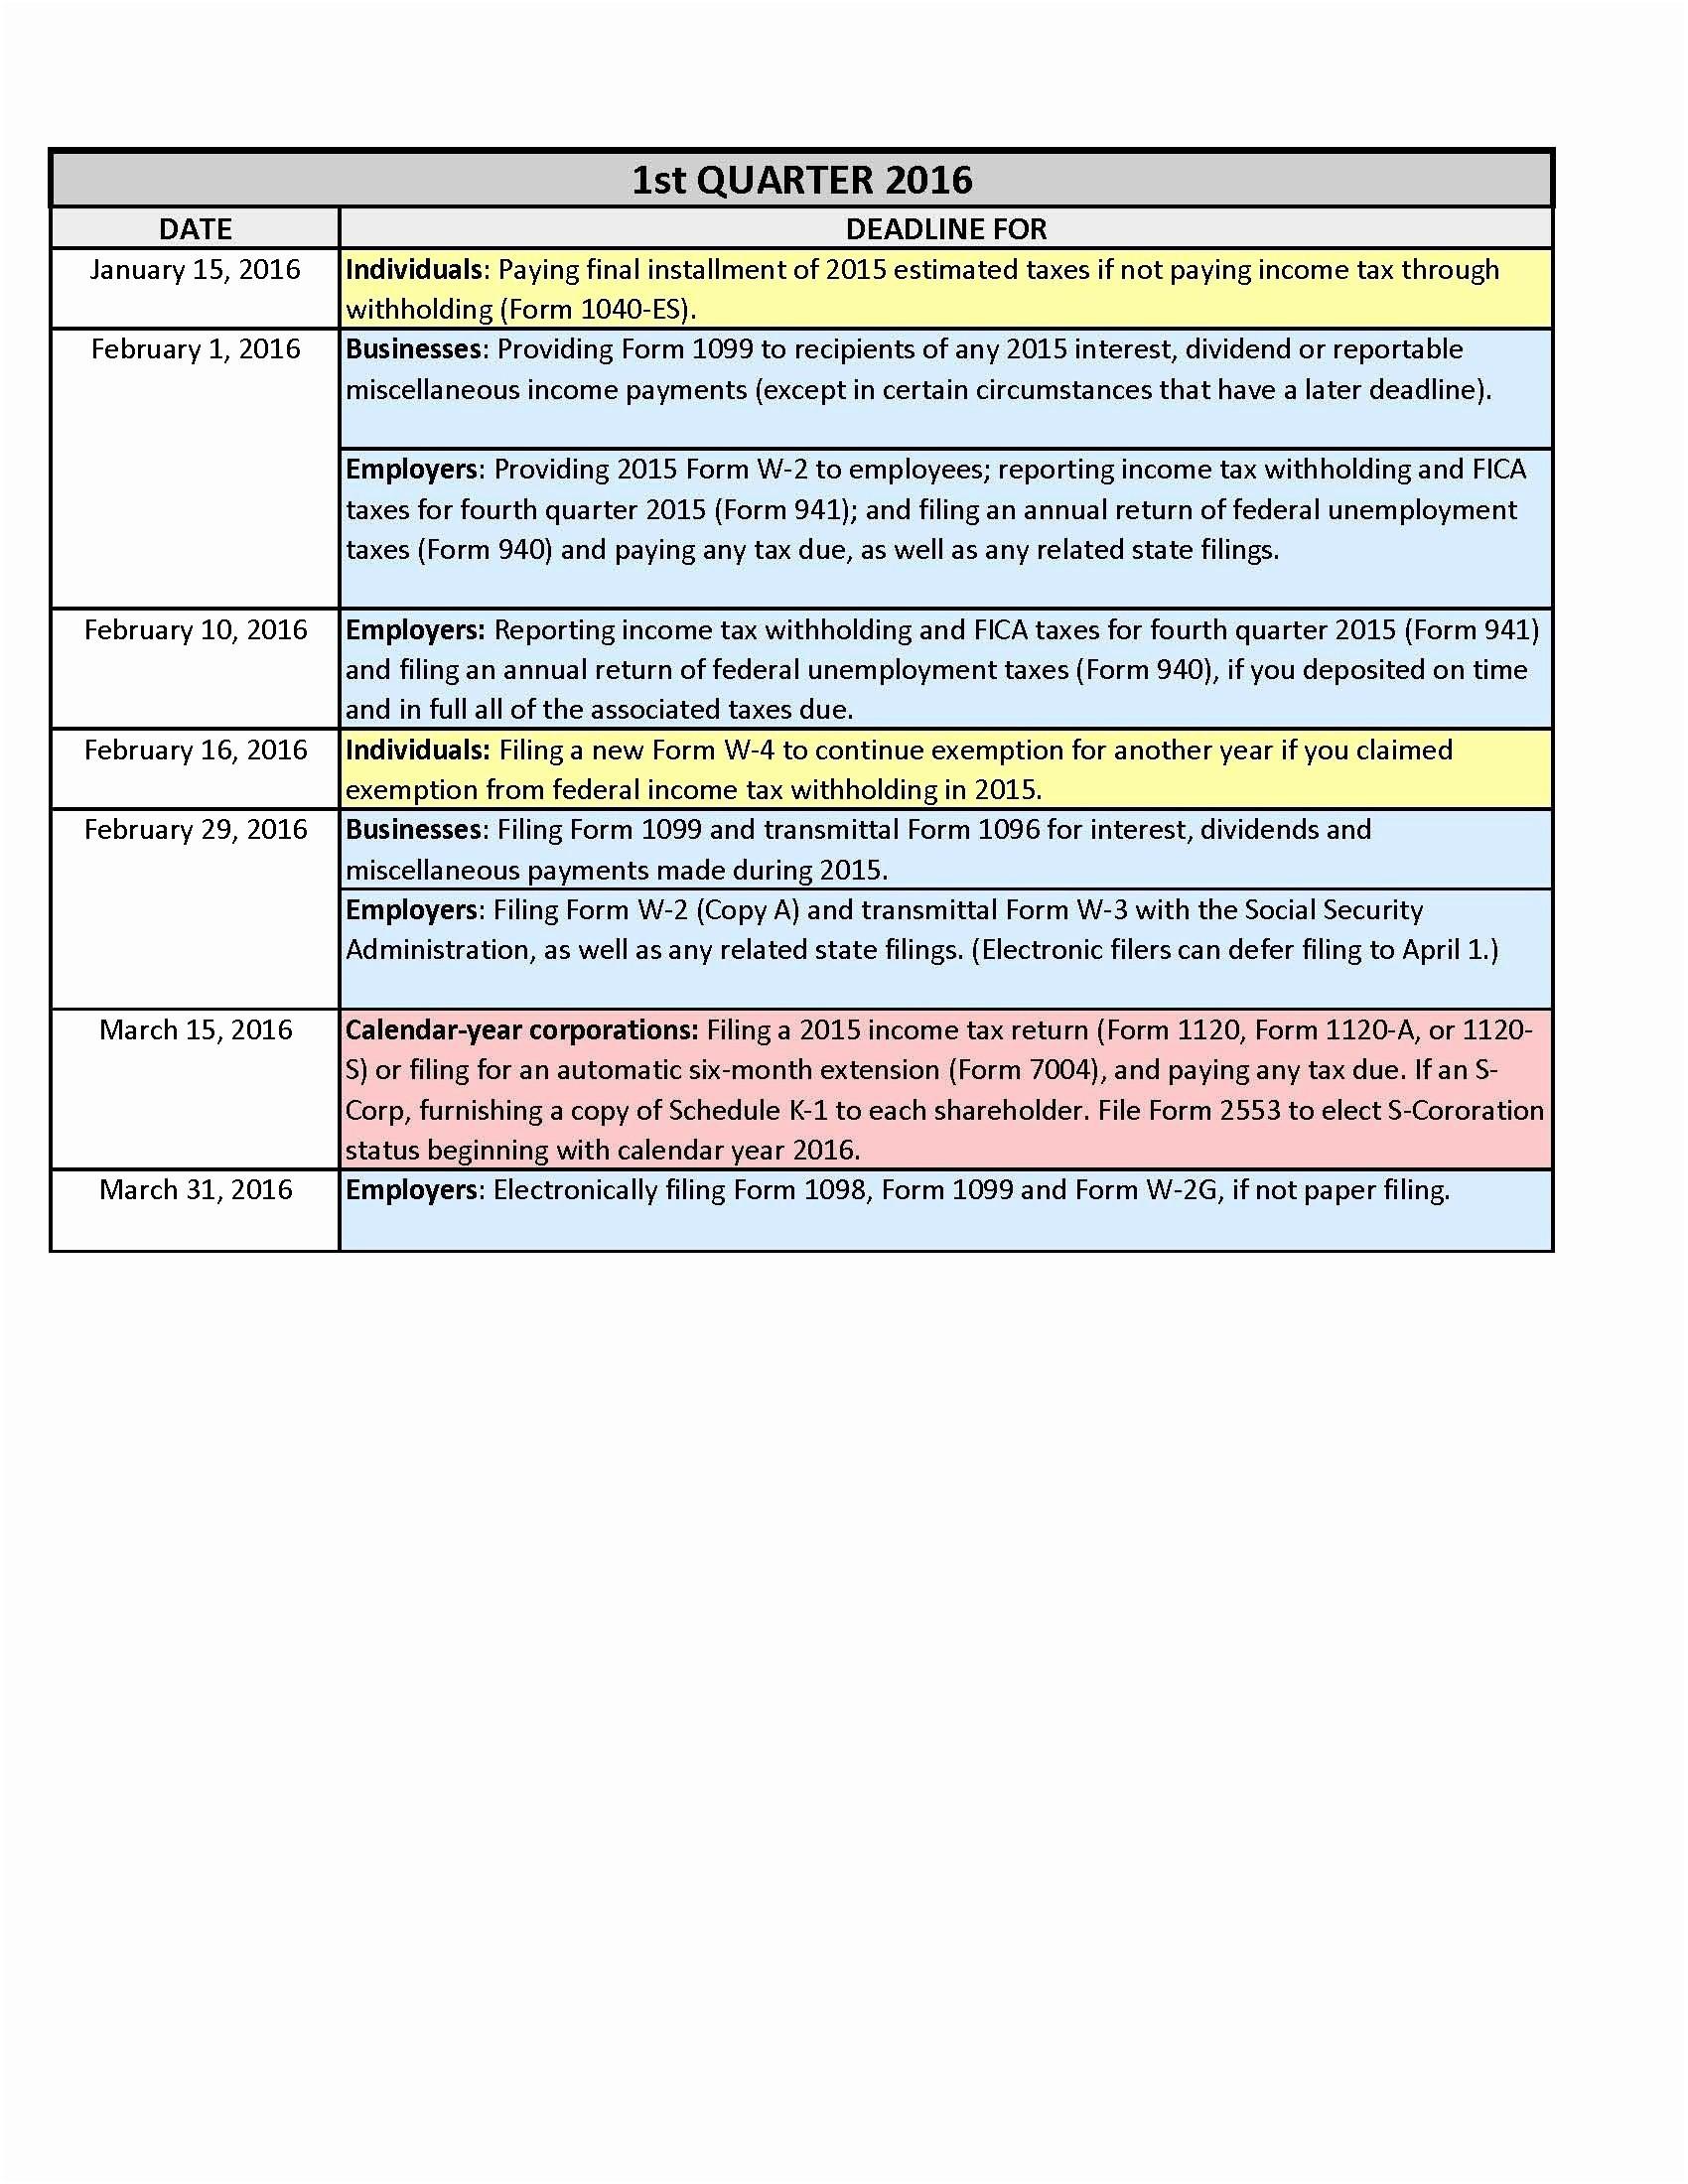 March Calendar Print Out Más Arriba-a-fecha Valid Sample Tax form 2019 Of March Calendar Print Out Recientes Monthly Calendar 2015 Template Printable 2016 Calendar Templates